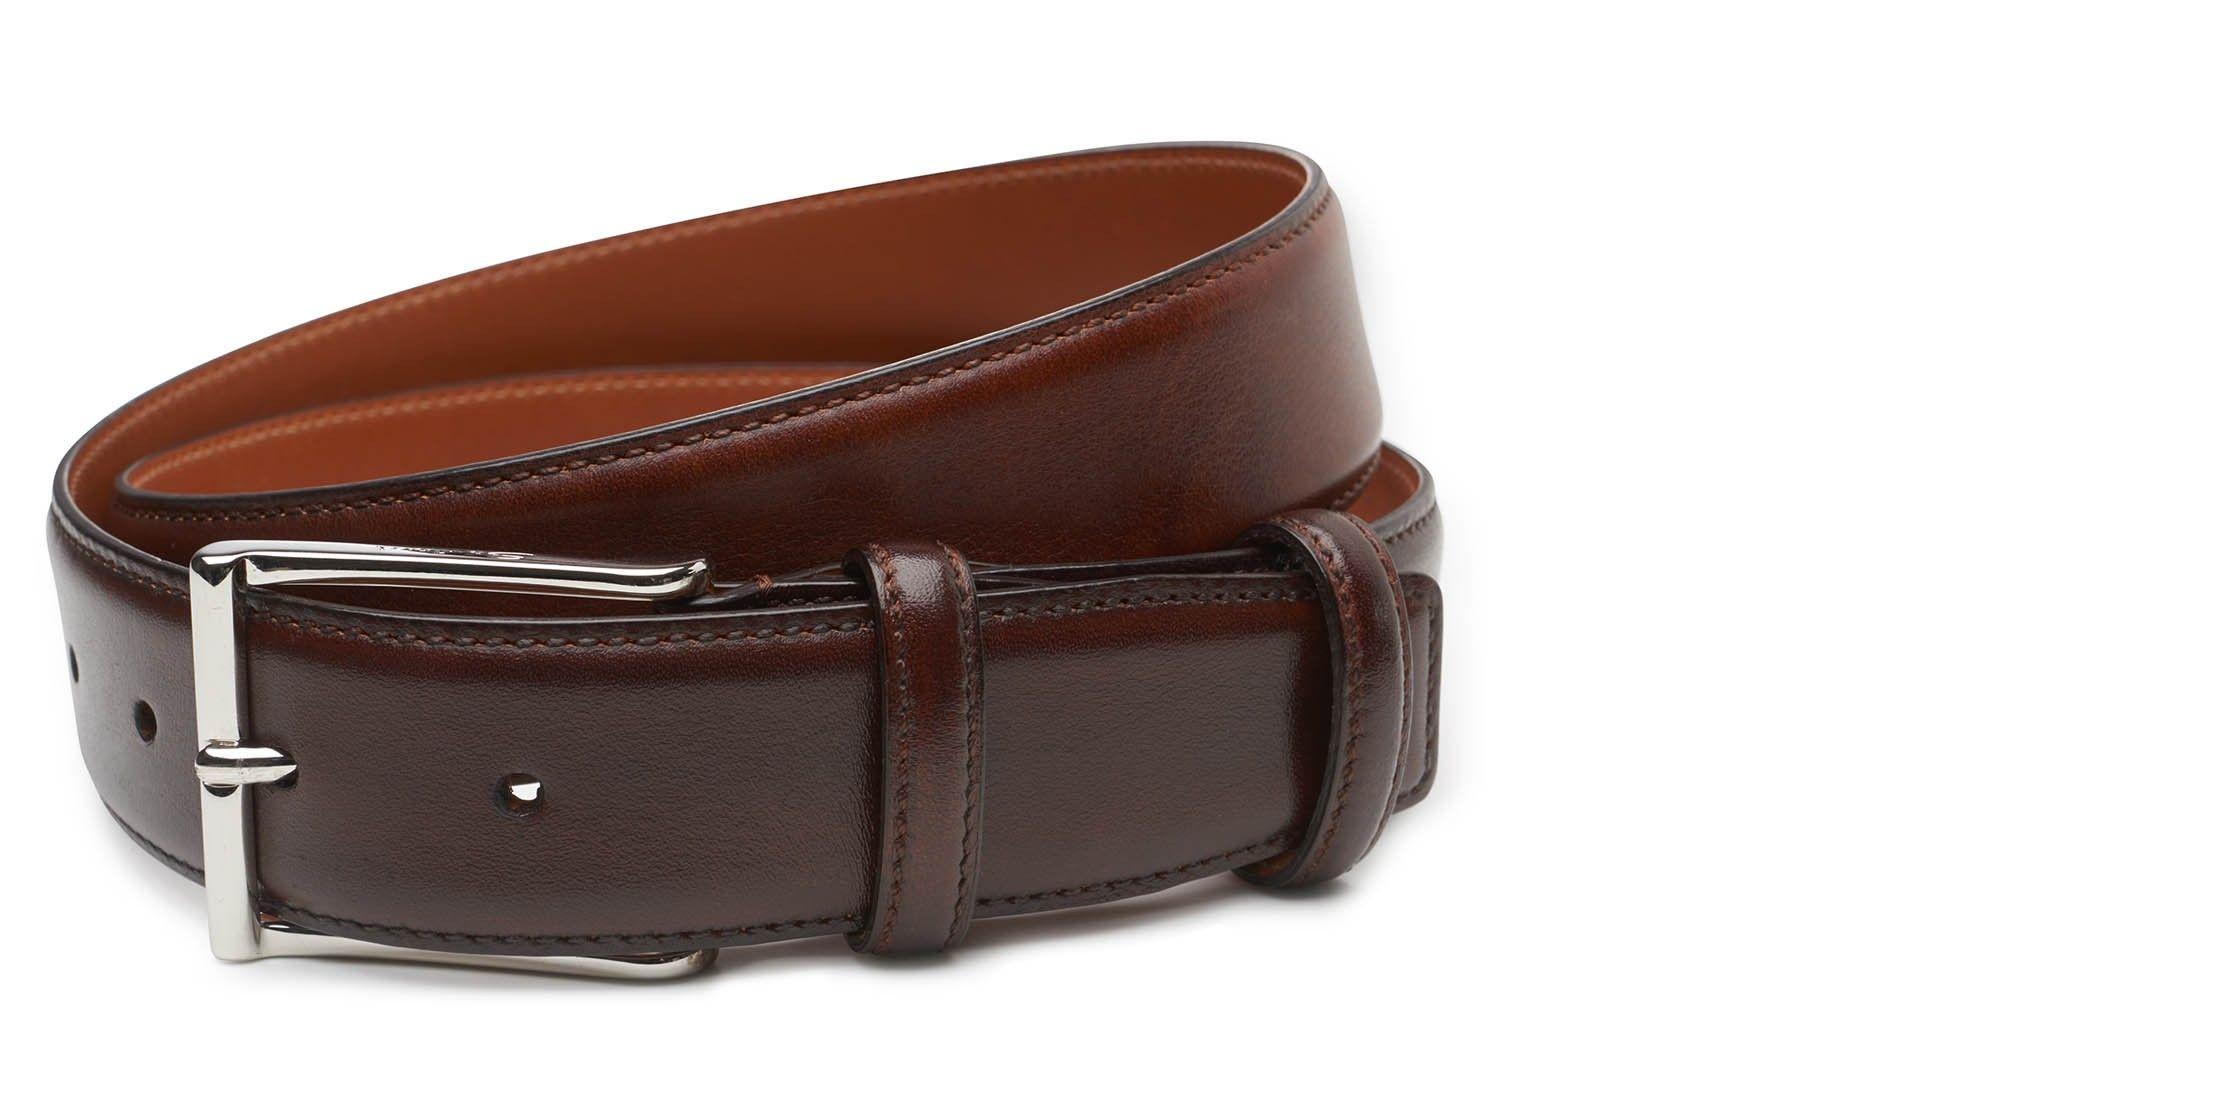 Classic belt made of smooth leather by Santoni. http://www.braun-hamburg.com/santoni-guertel-dunkelbraun-108.html